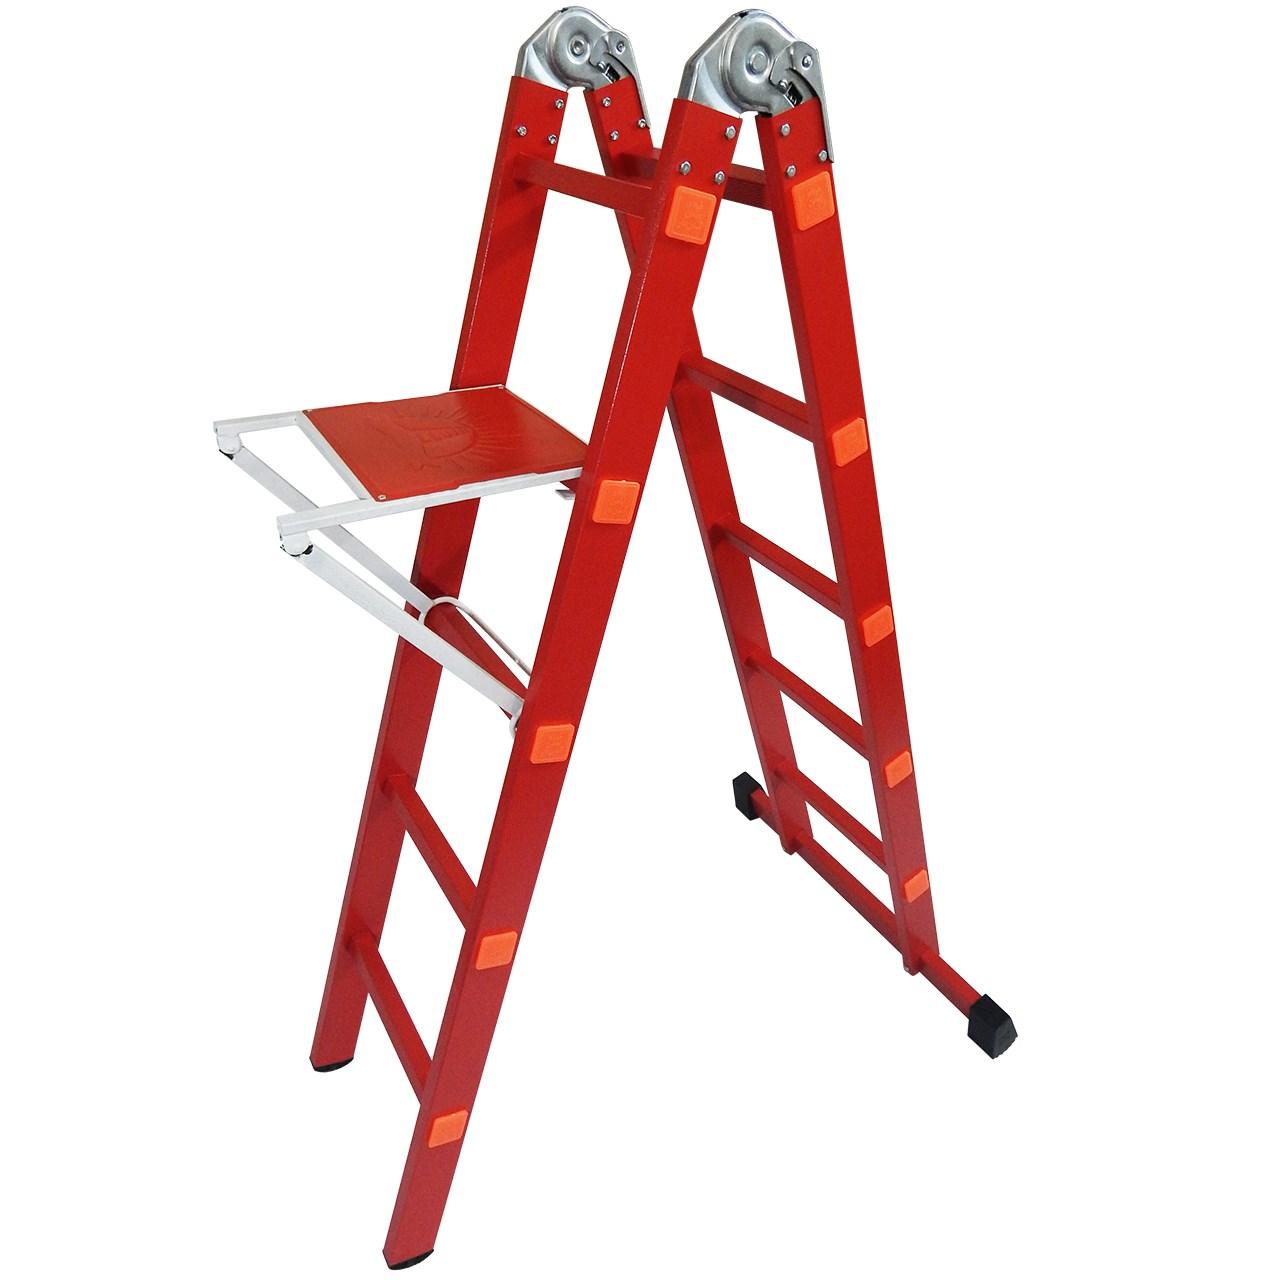 نردبان 10 پله آسانکار مدل As10s